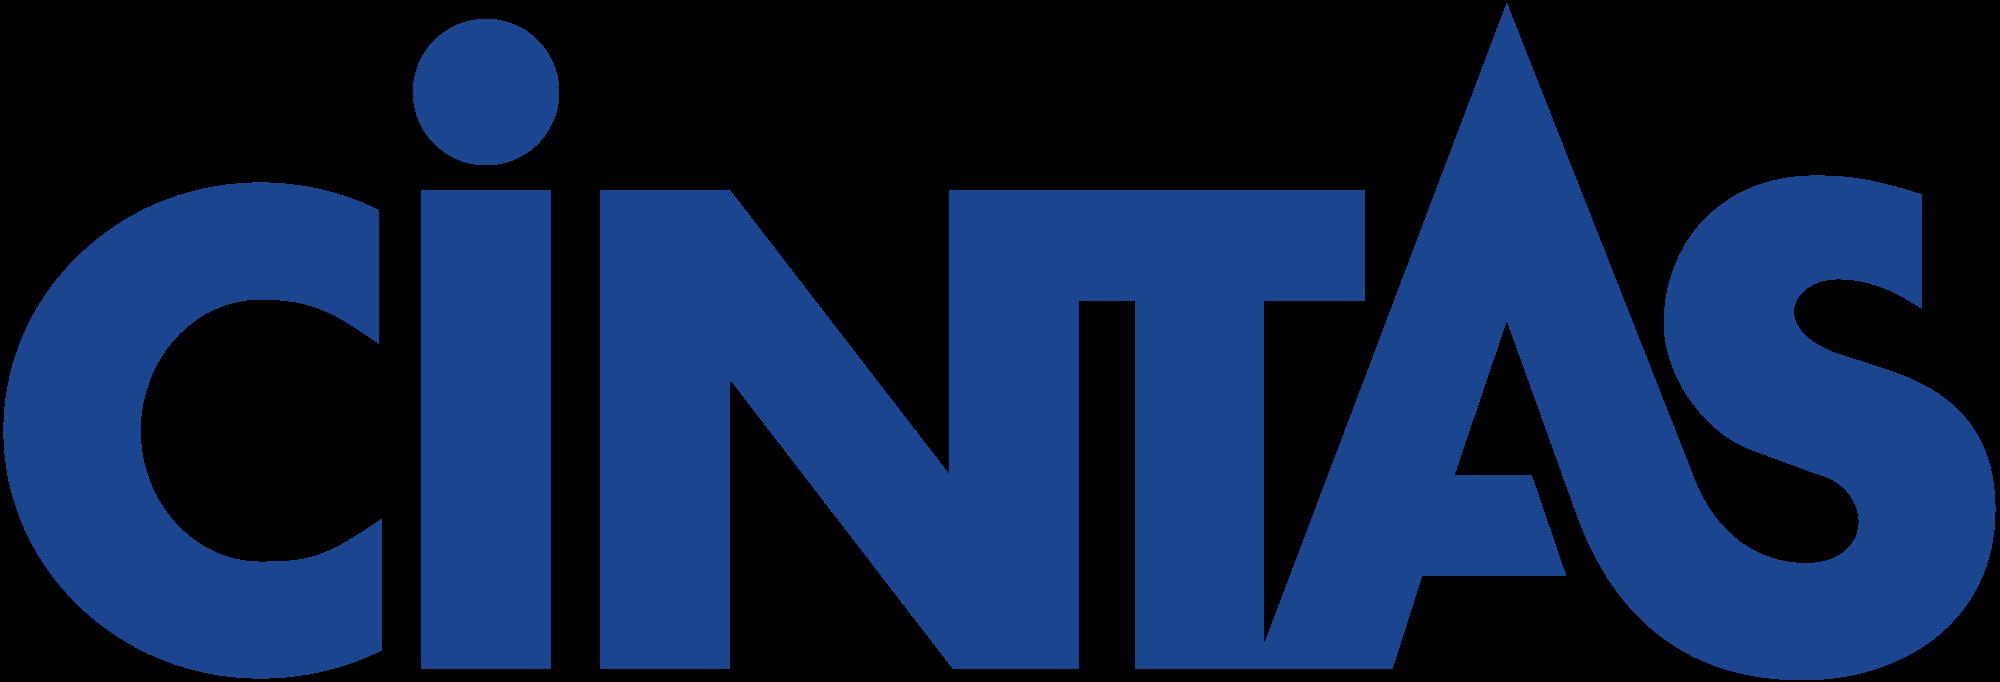 Cintas-Logo.SVG.png